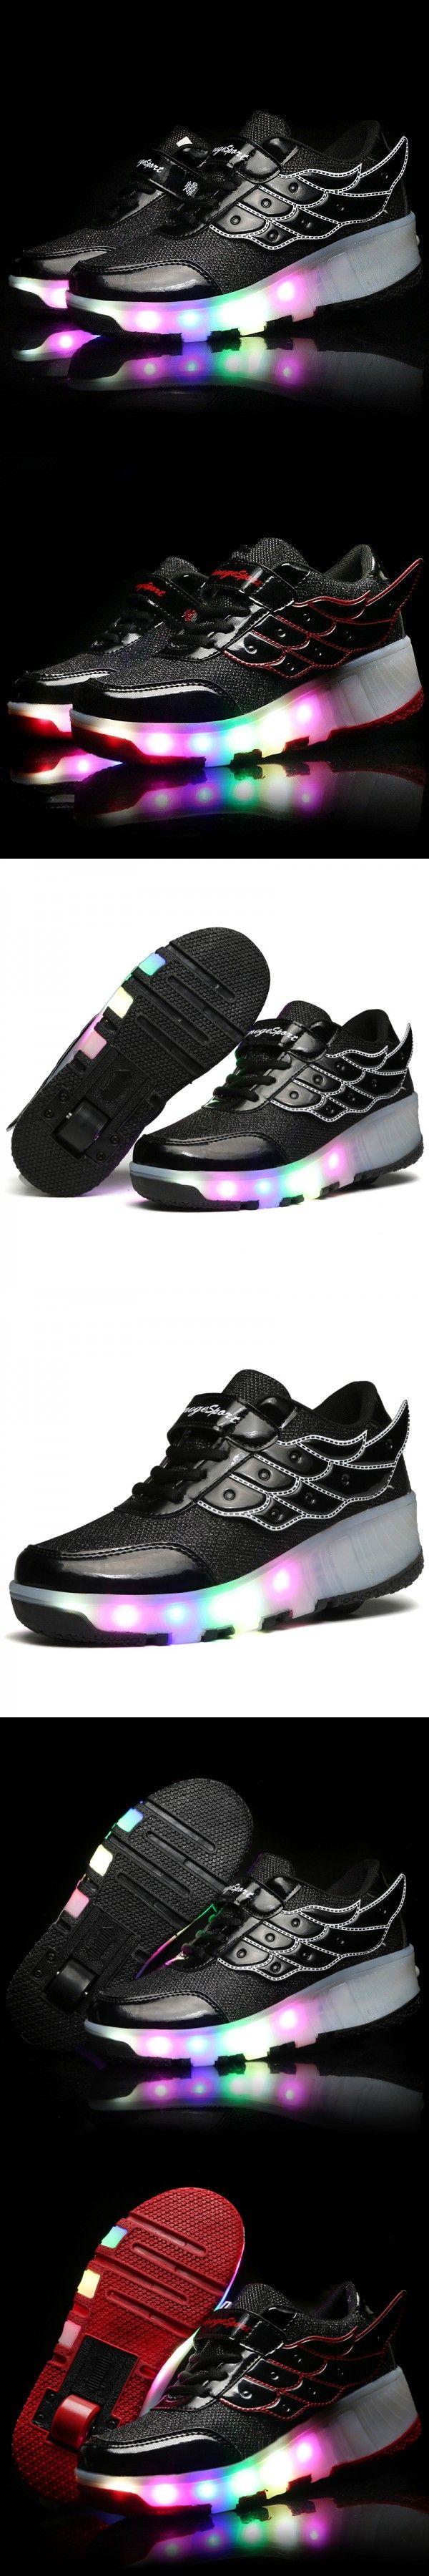 Roller skate shoes size 10 - 2016 Brands Hot New Arrived Children Shoes Girls Boys Wing Led Light Sneakers Shoes With Wheel Kids Roller Skate Shoes